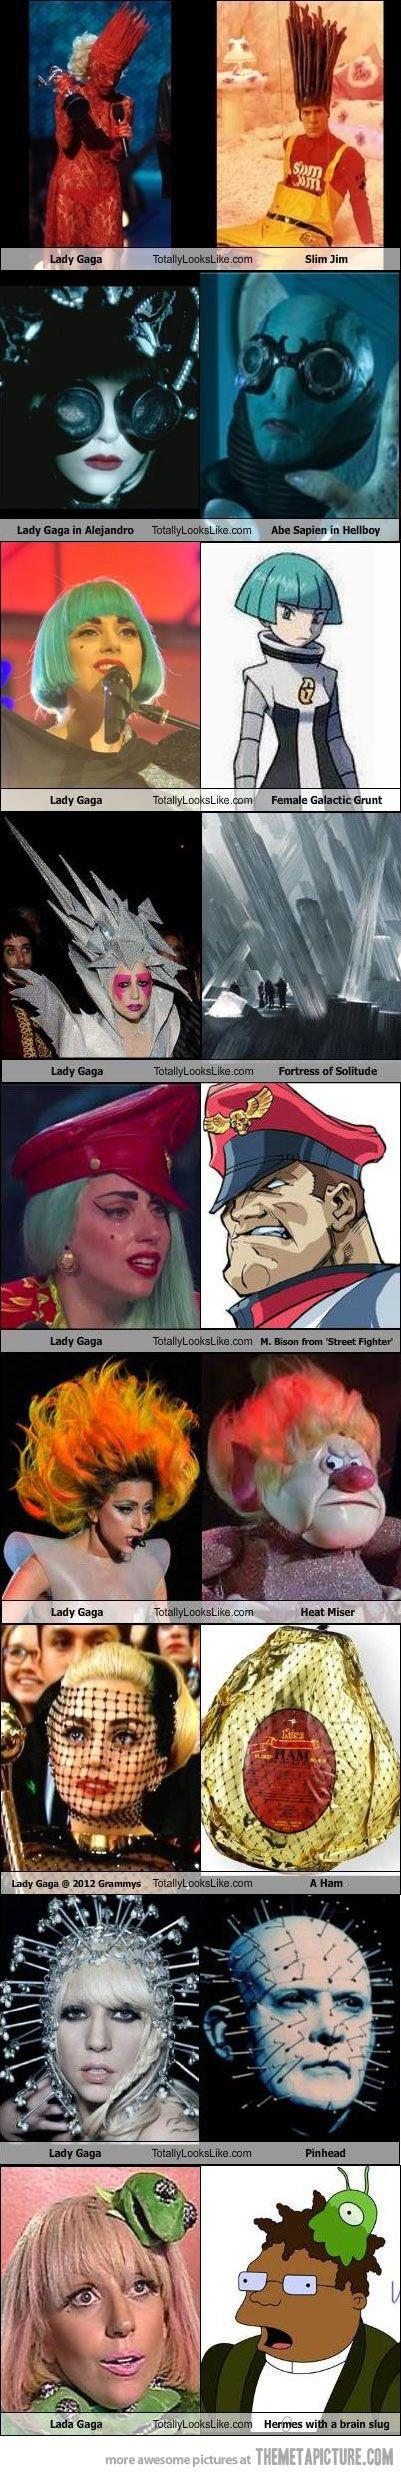 LOL Lady Gaga Totally Looks Like! ..  #ladygaga #funny